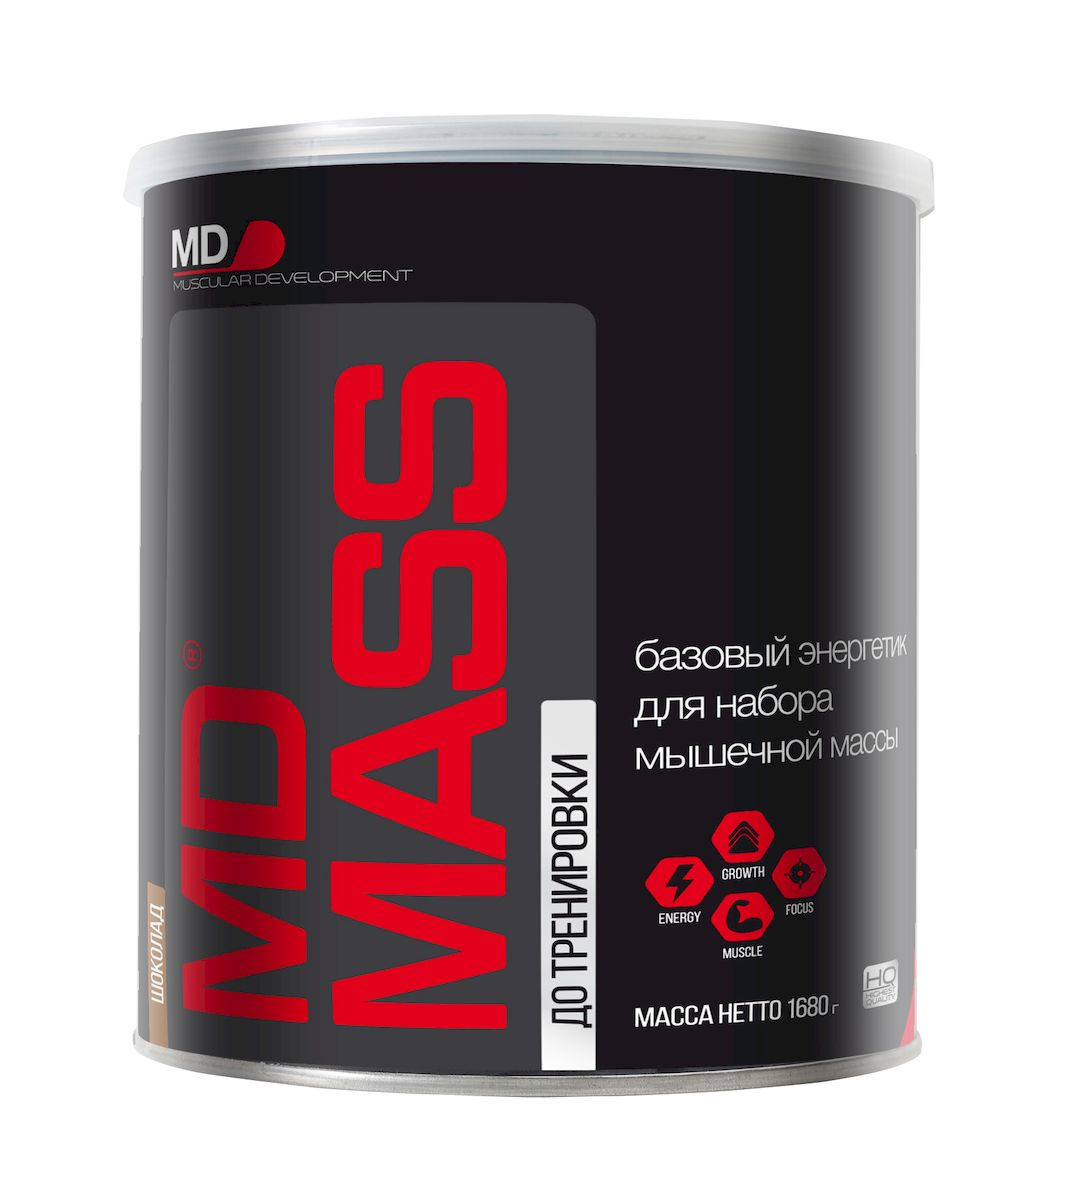 MD Энергетик  Масс , 1,68 кг, шоколадный - Энергетики